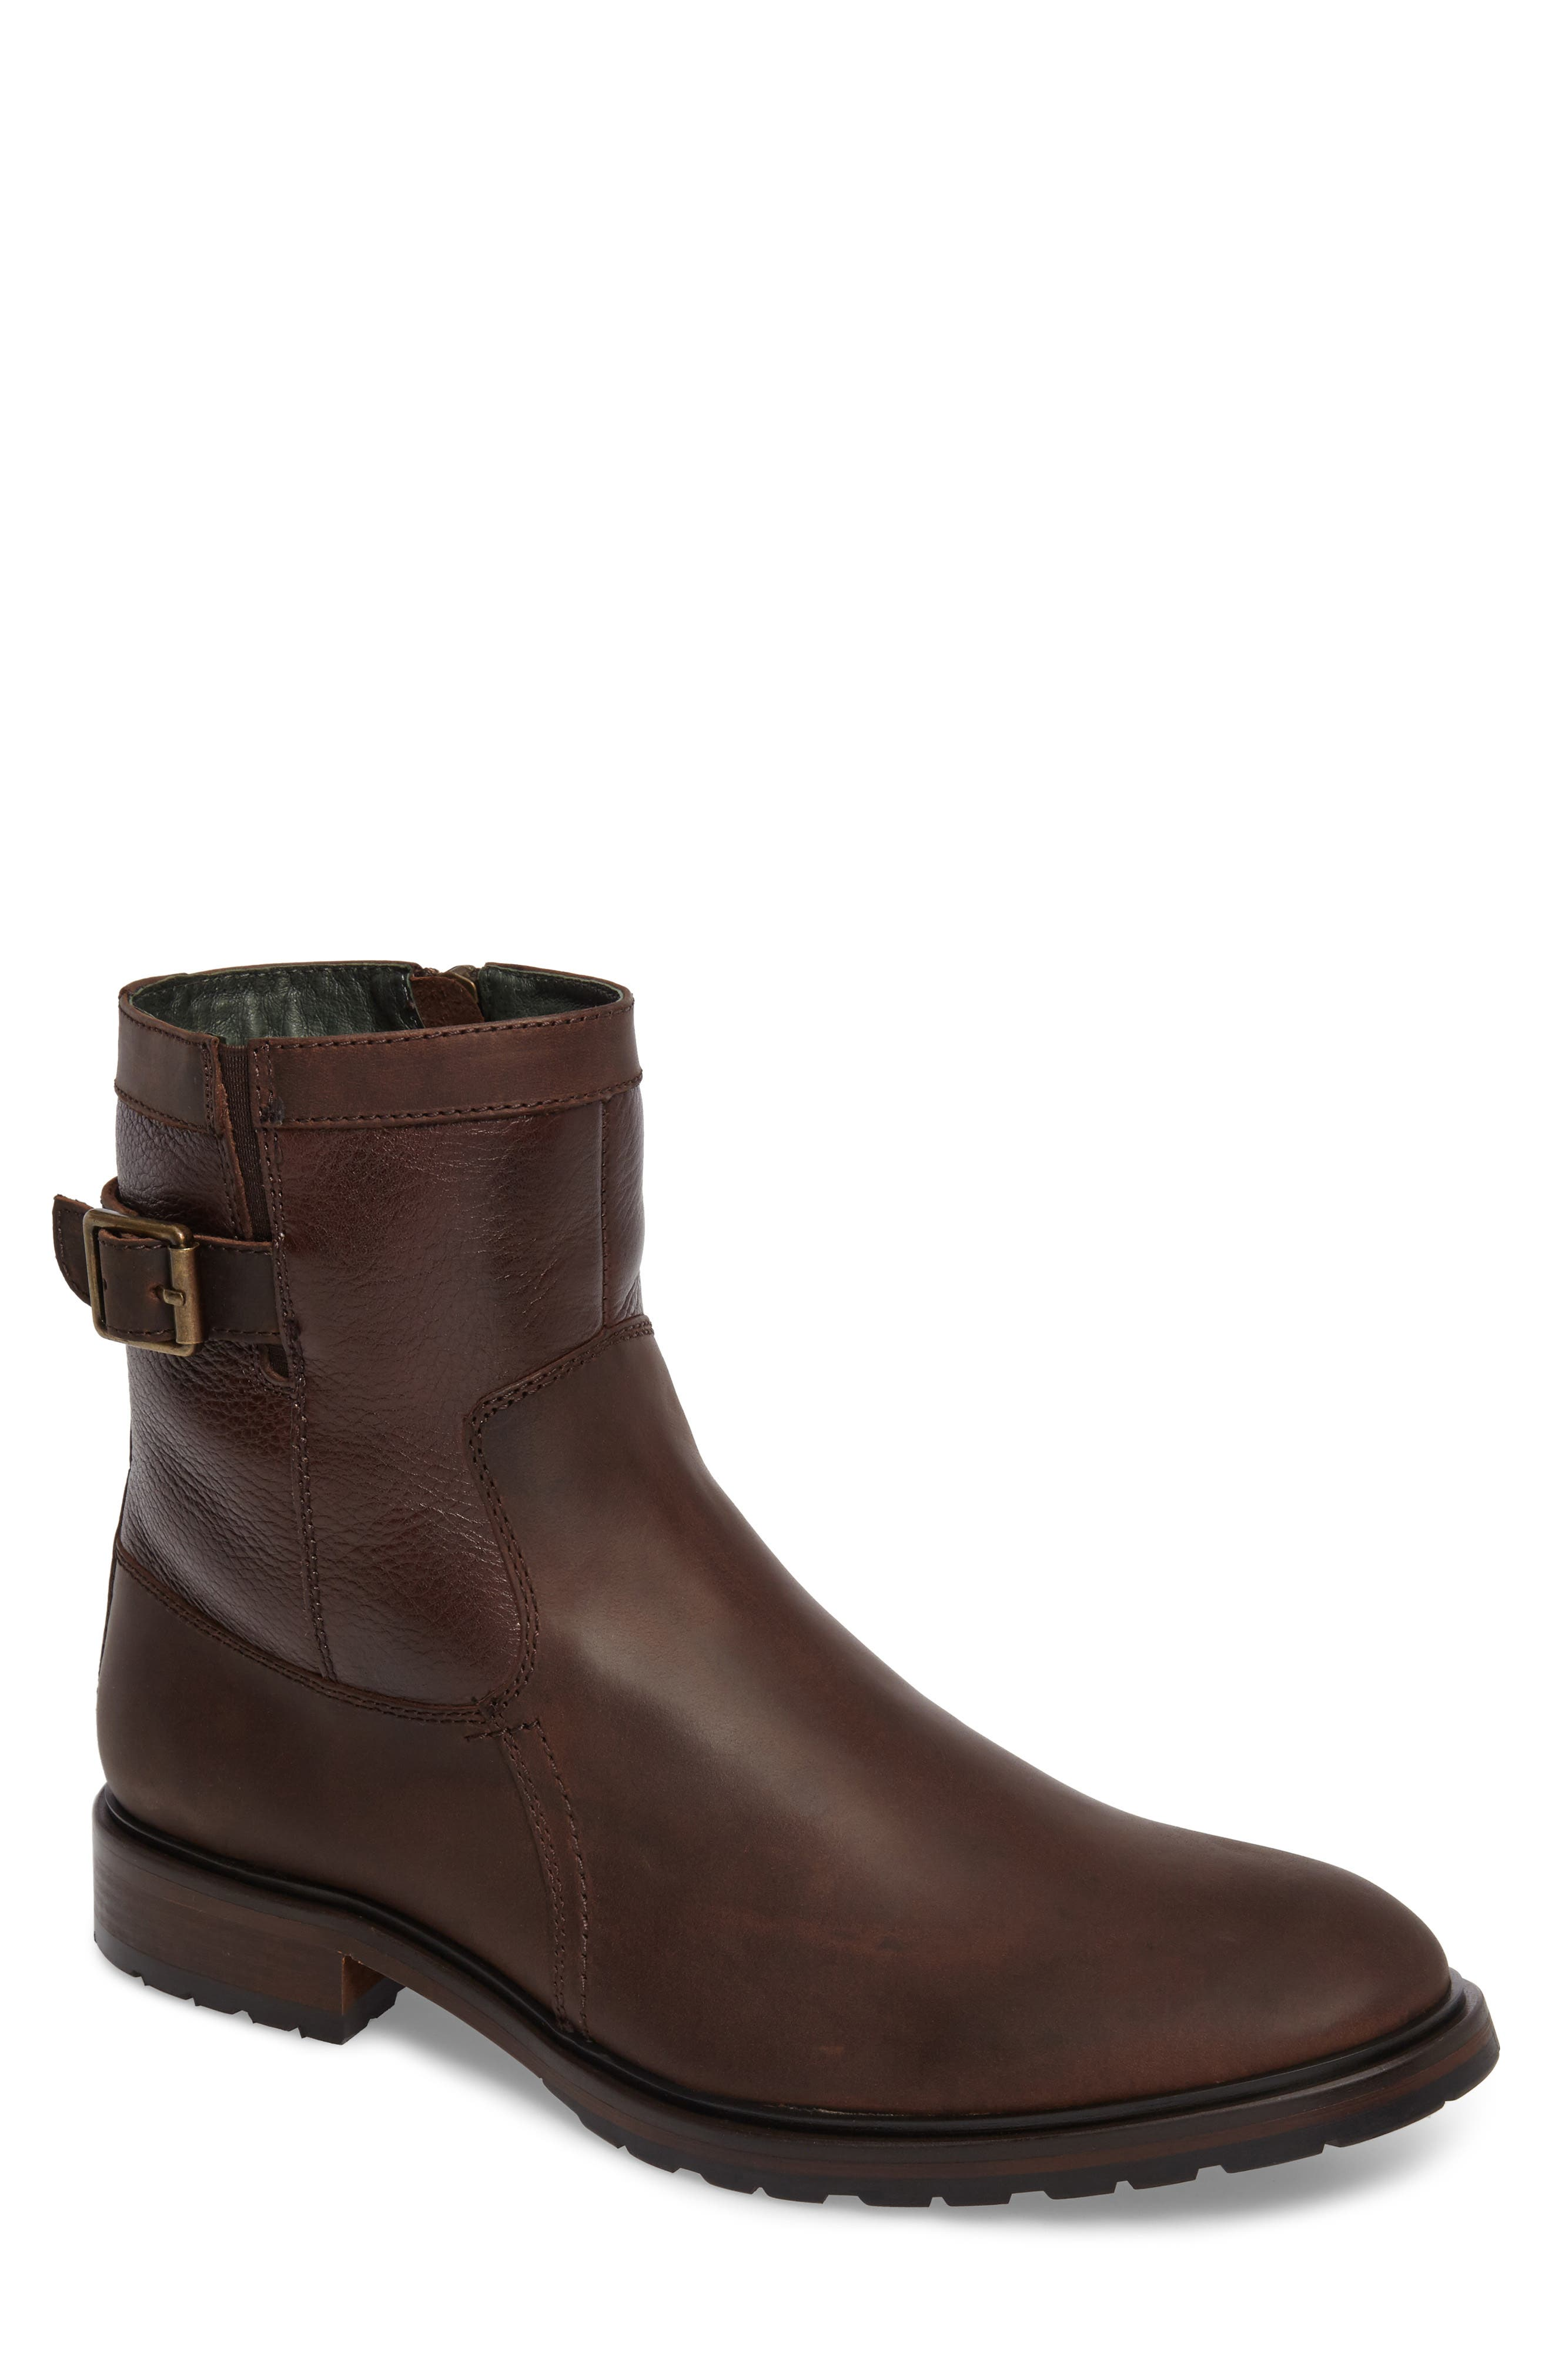 Alternate Image 1 Selected - J&M 1850 Myles Zip Boot (Men)